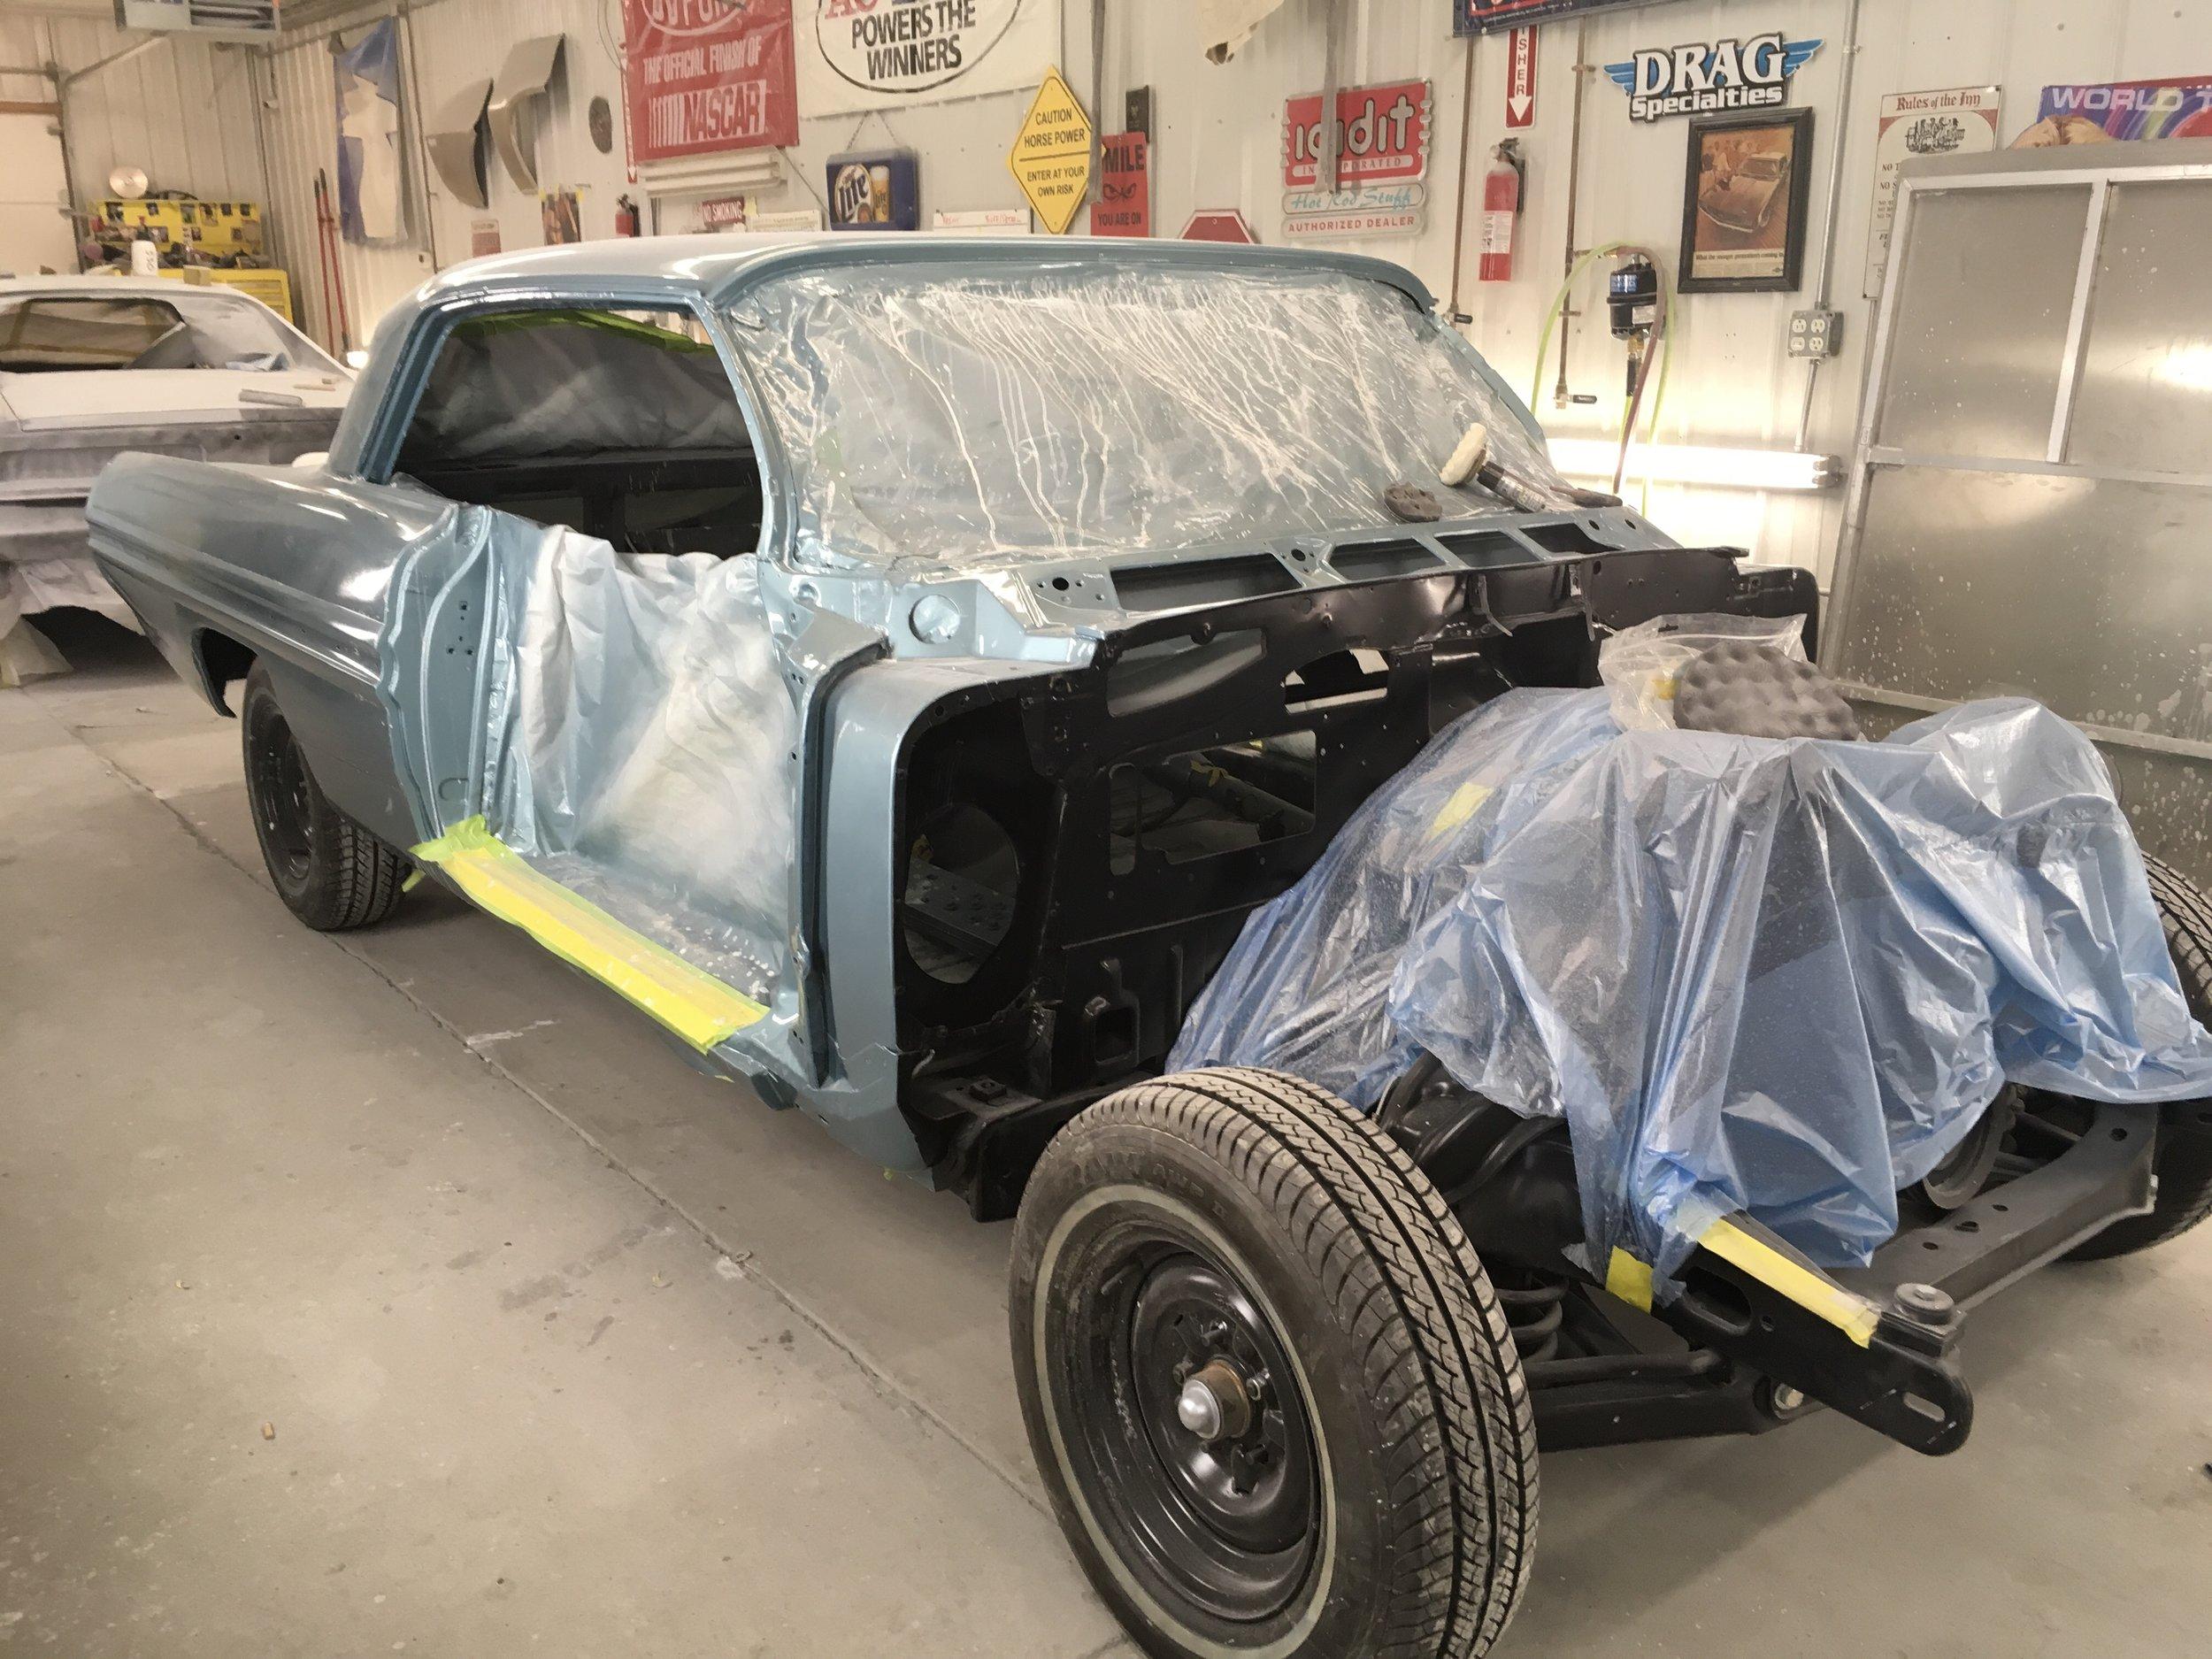 1962-pontiac-bonneville-minneapolis-hot-rod-custom-build-restoration-22.jpg